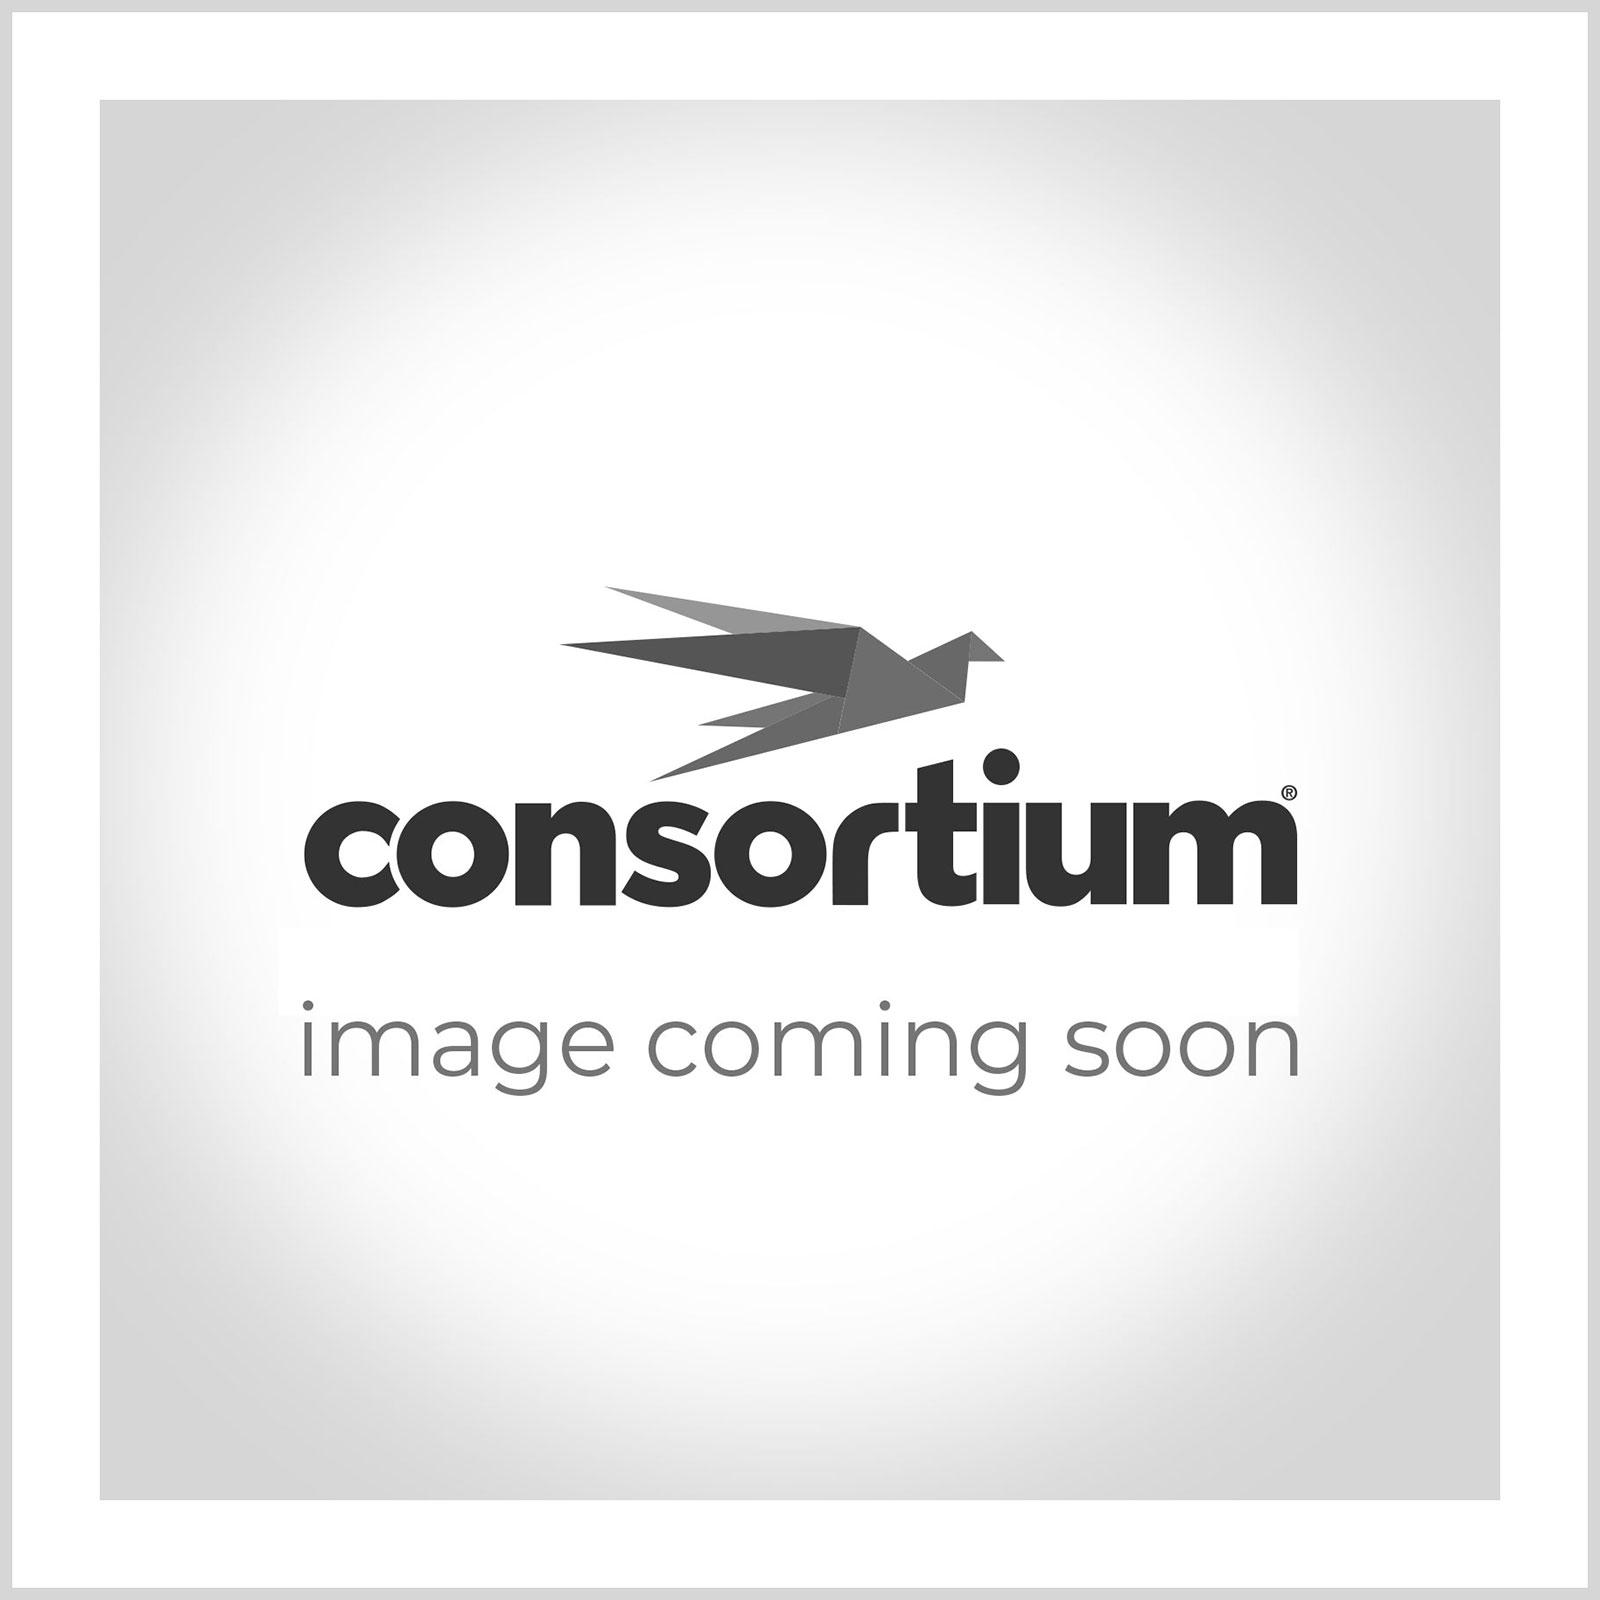 Evo-Stik Impact Adhesive